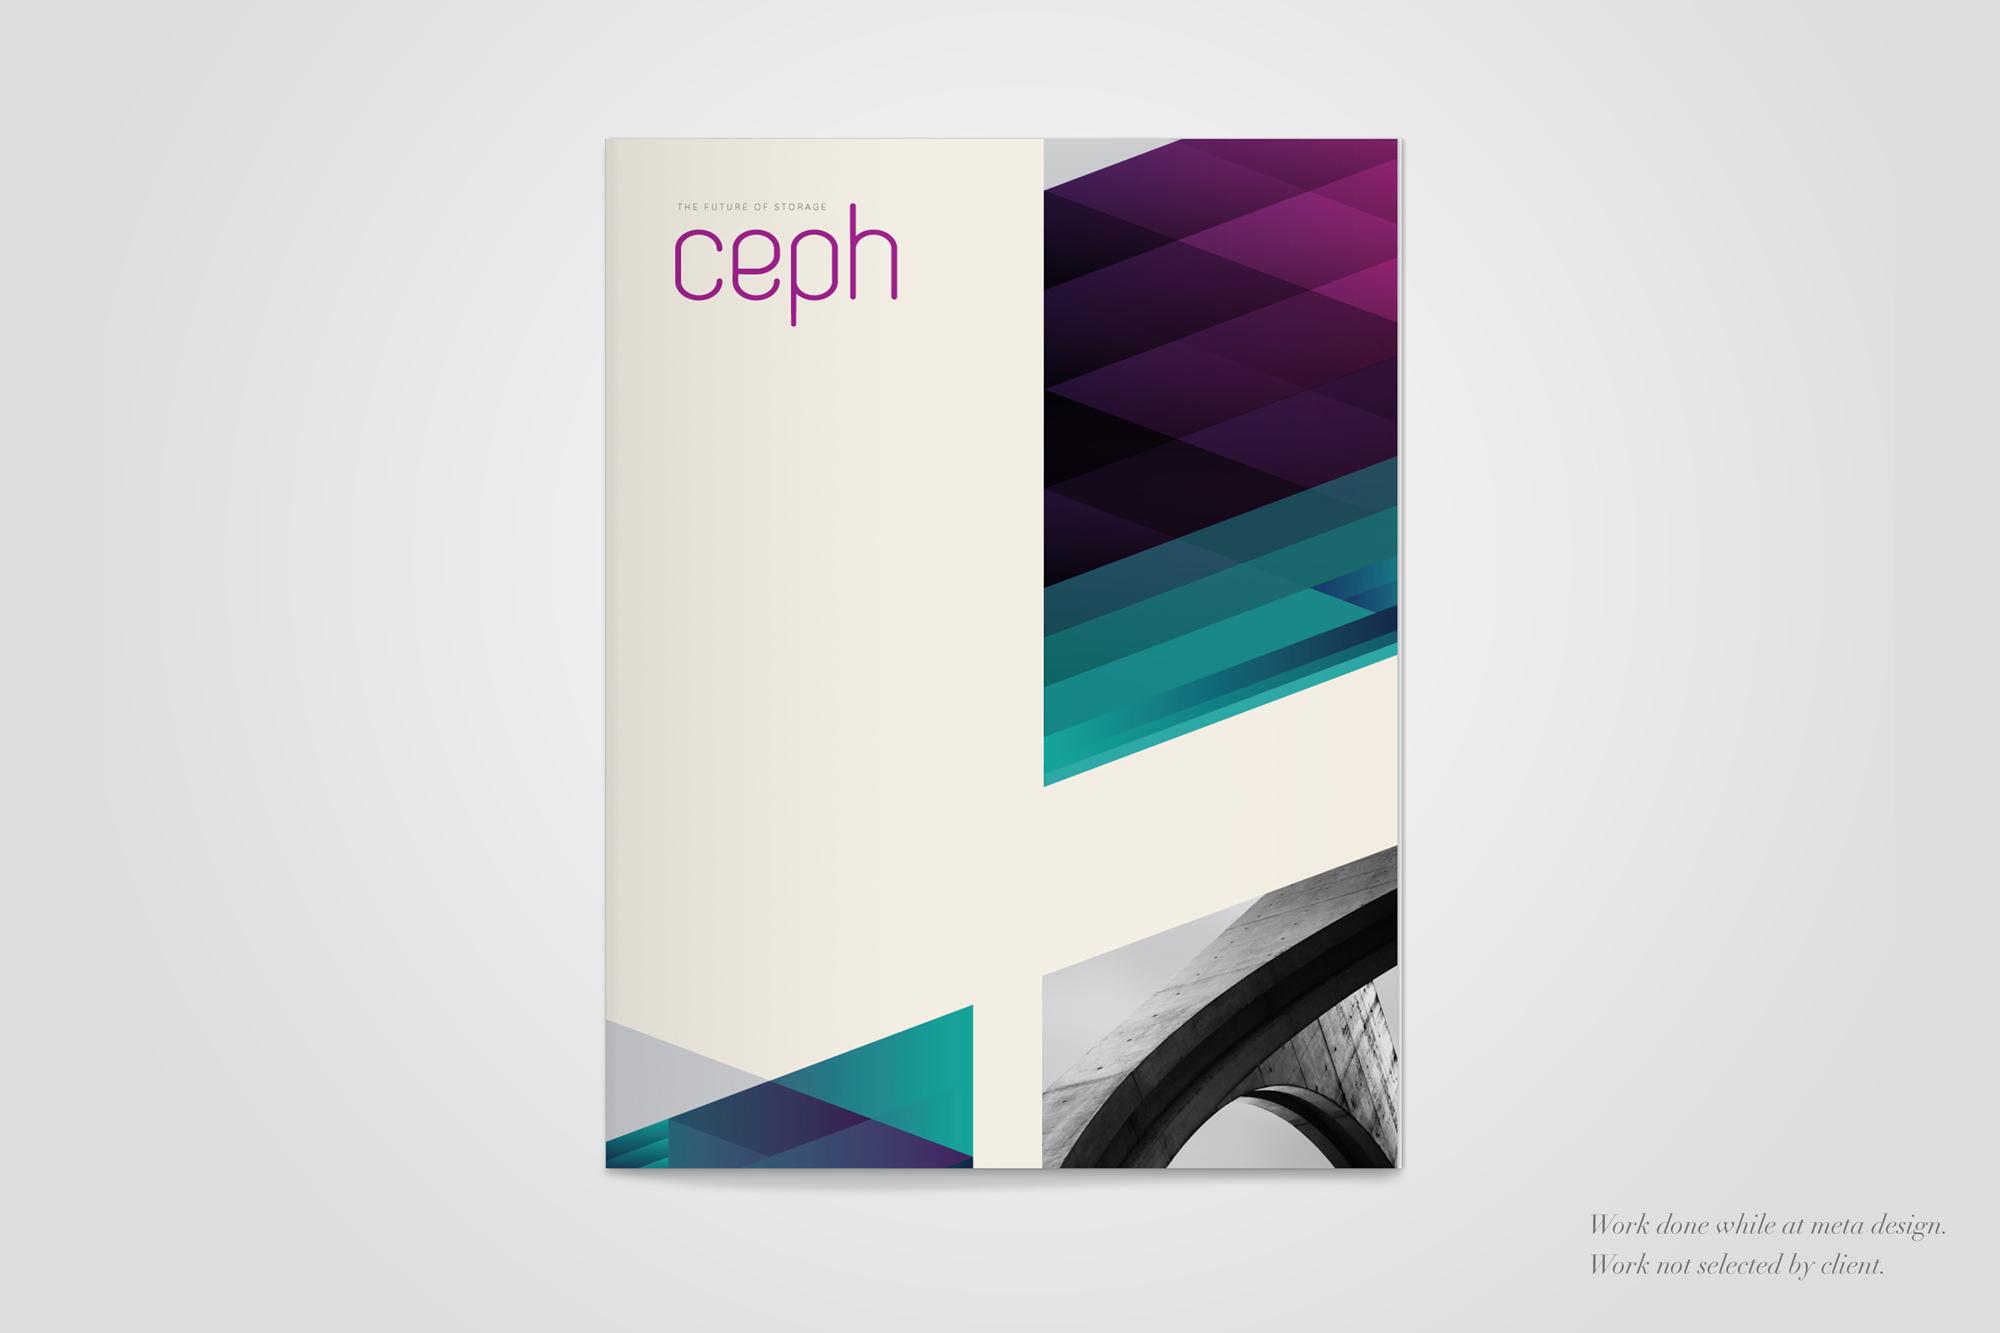 KatieKingRumford_Ceph_System_CephBrochure.jpg